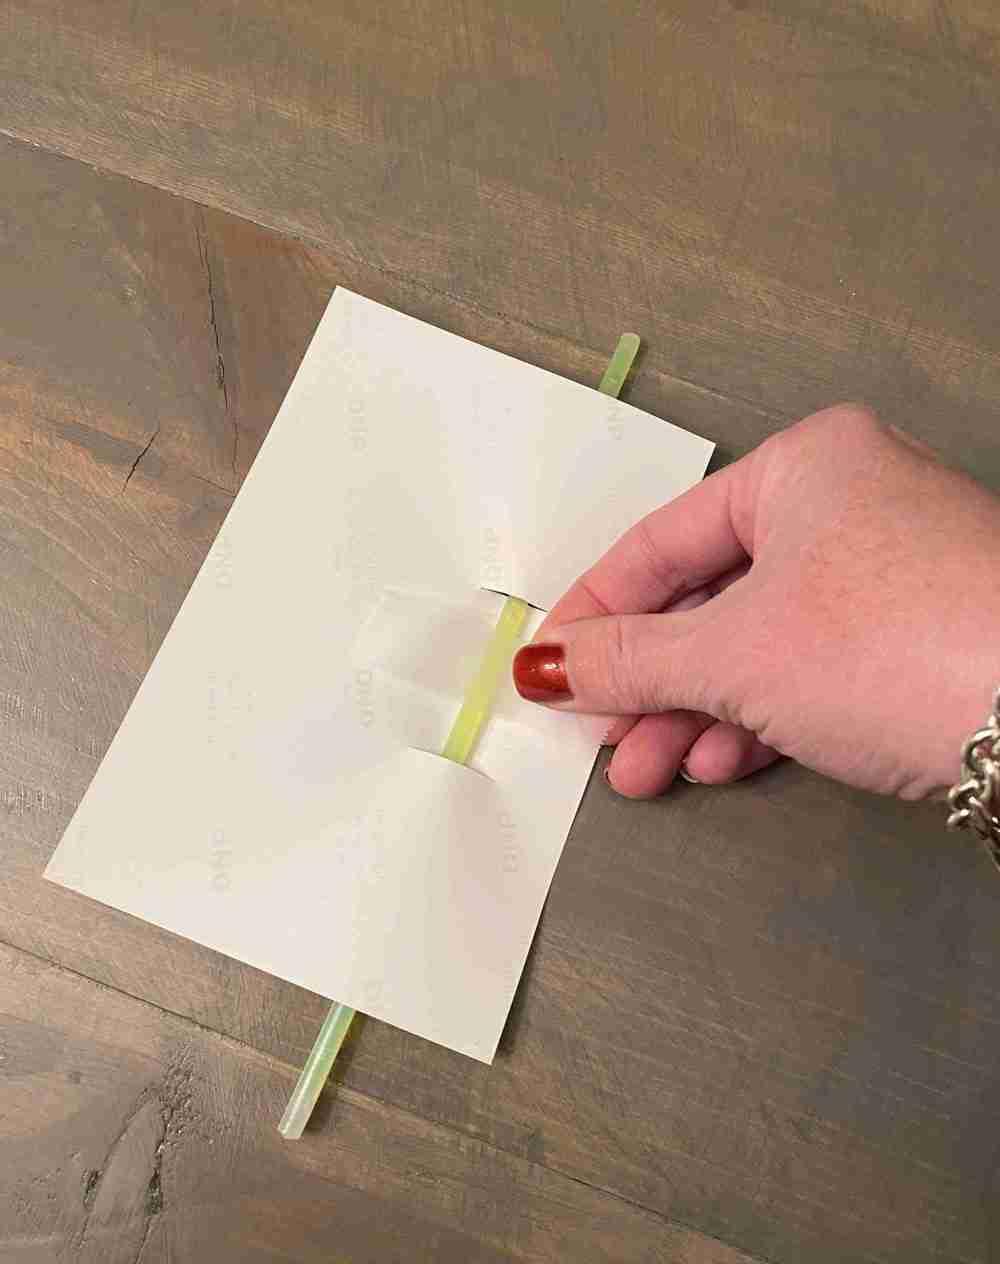 Valentine Walgreens photo, yellow glow stick, scotch tape